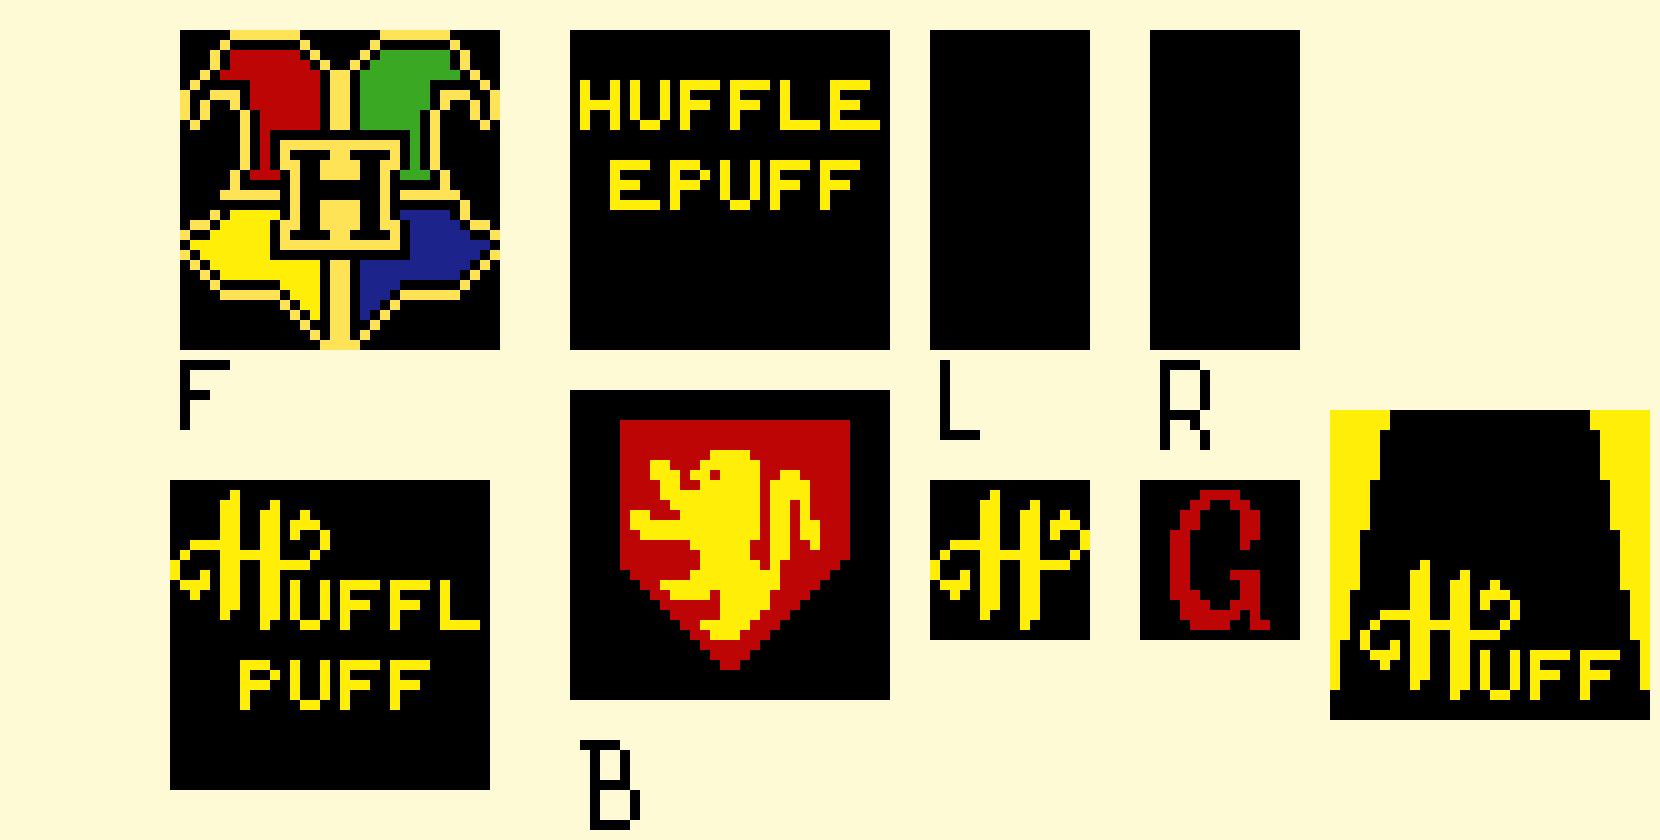 Acnl Hogwarts Pixel Art Maker